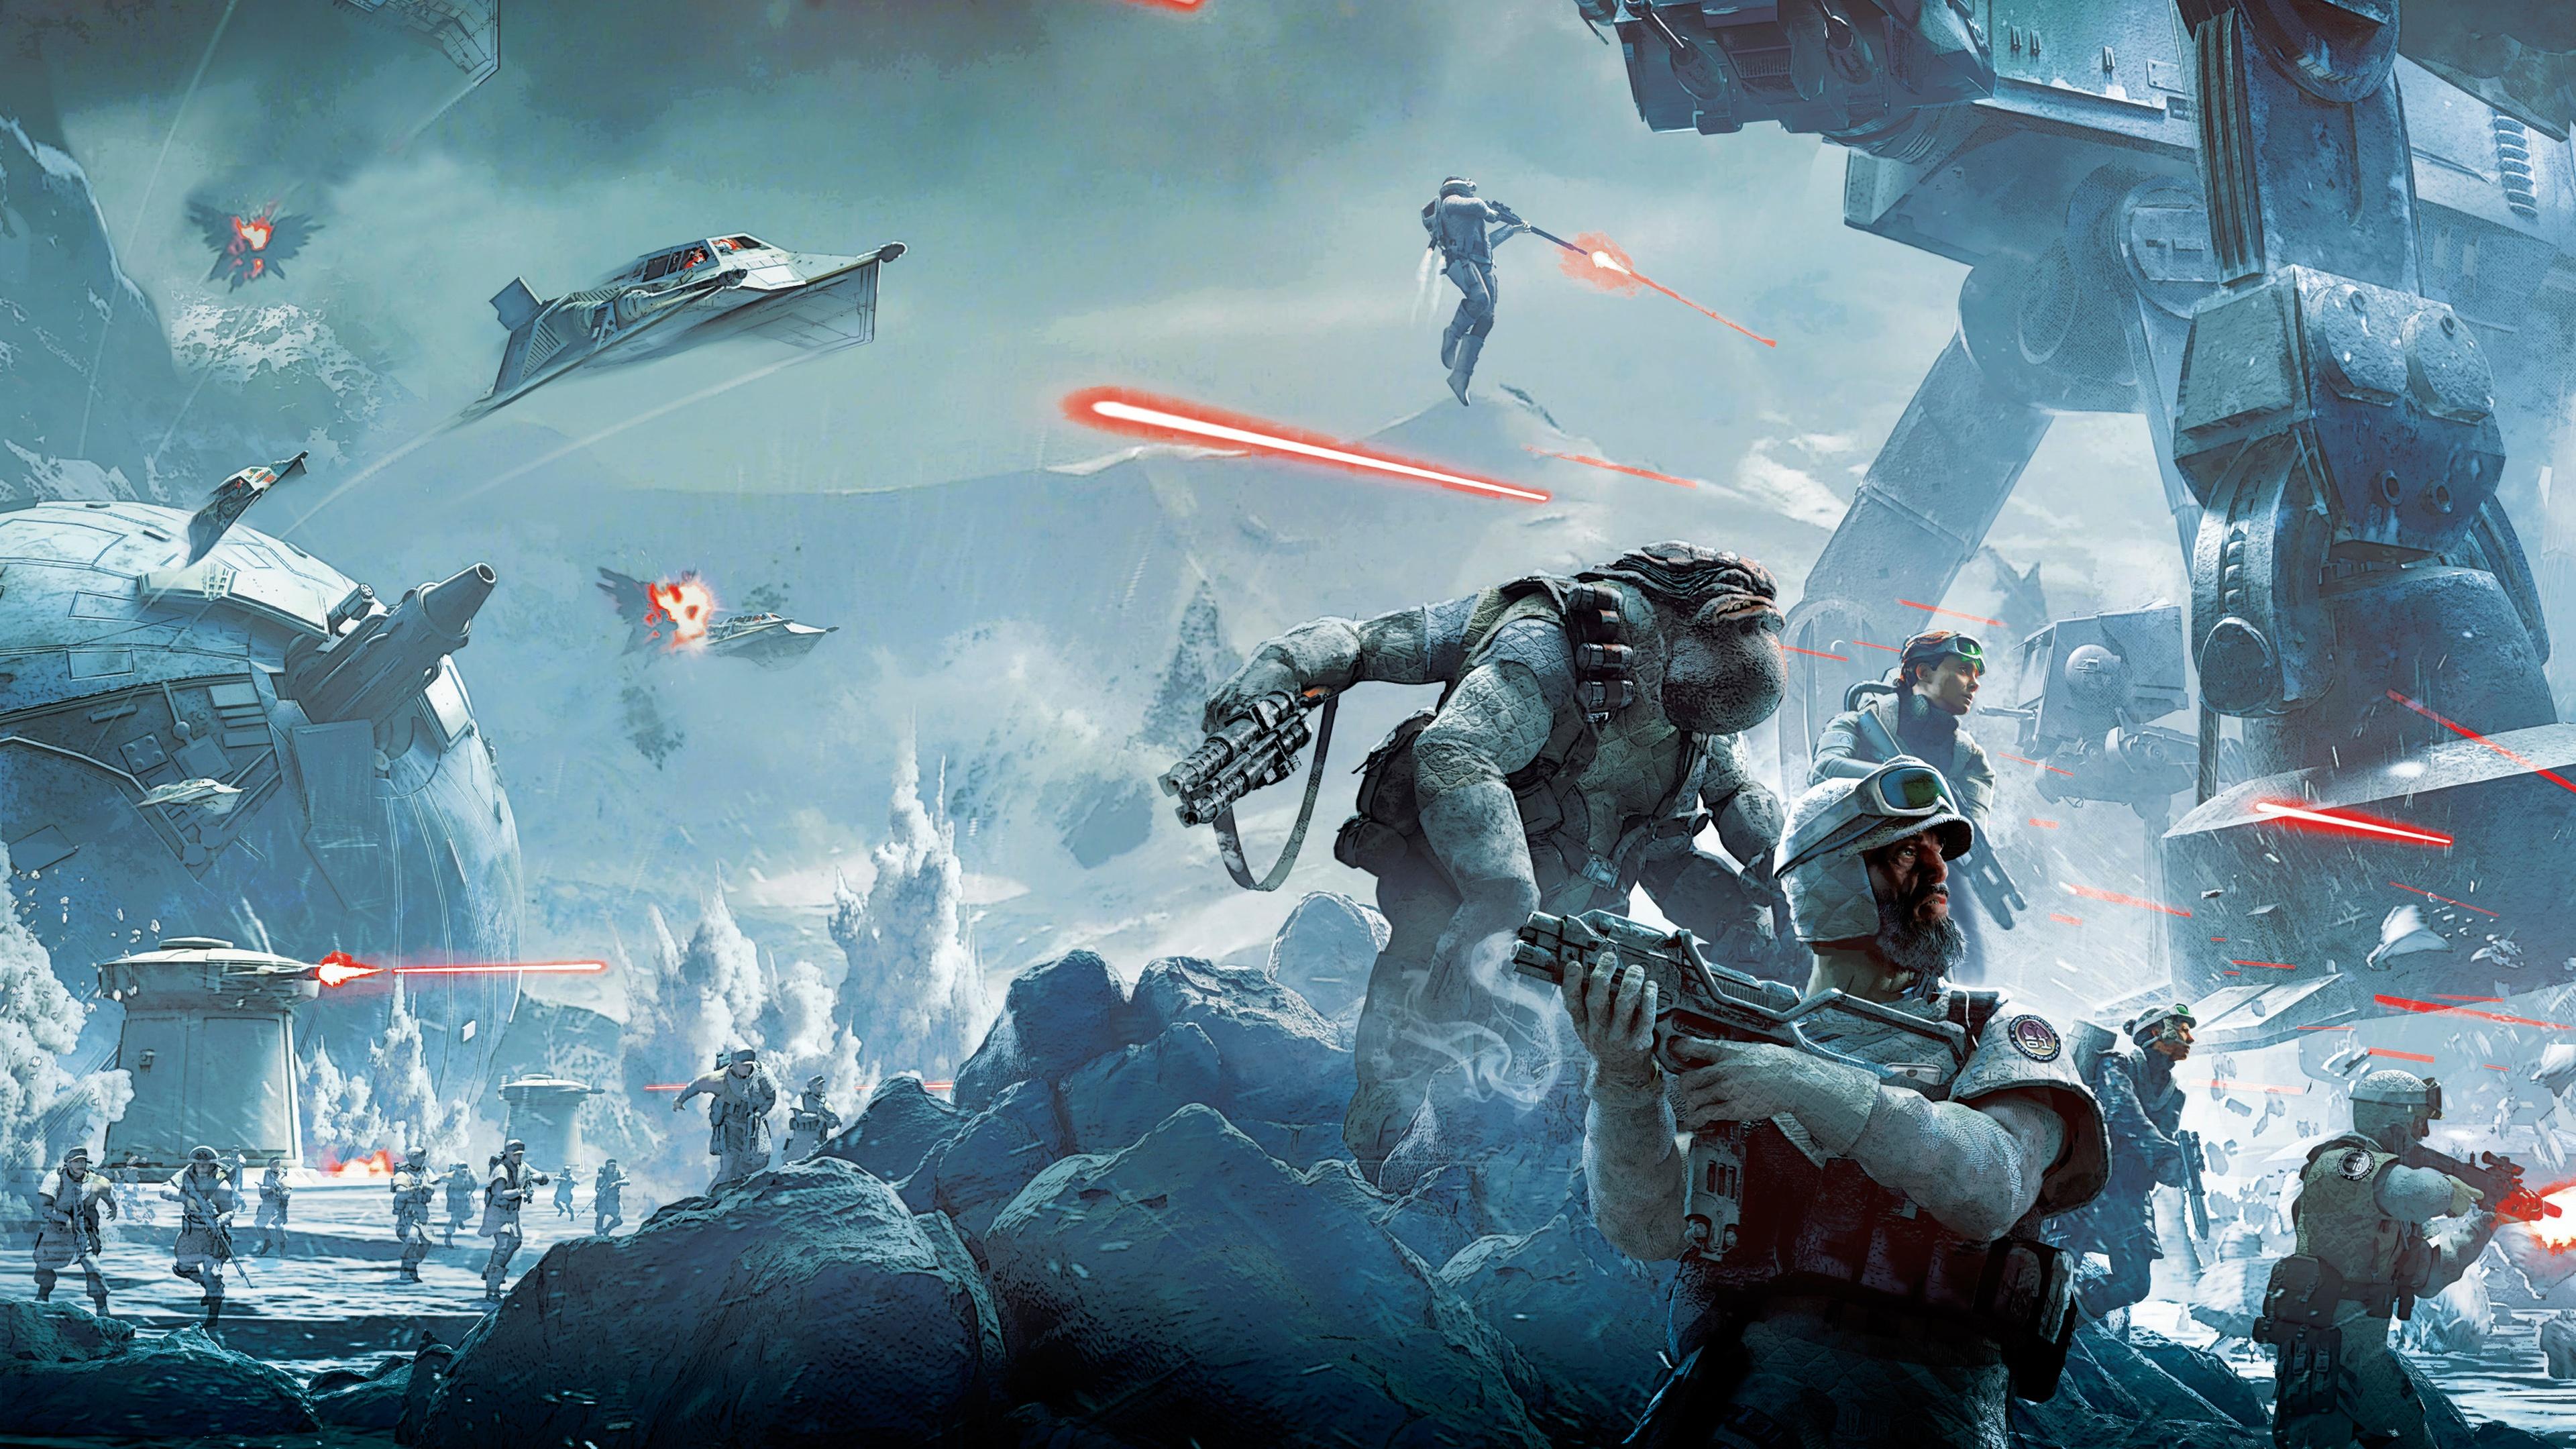 Star Wars Battlefront 4K Wallpaper - WallpaperSafari